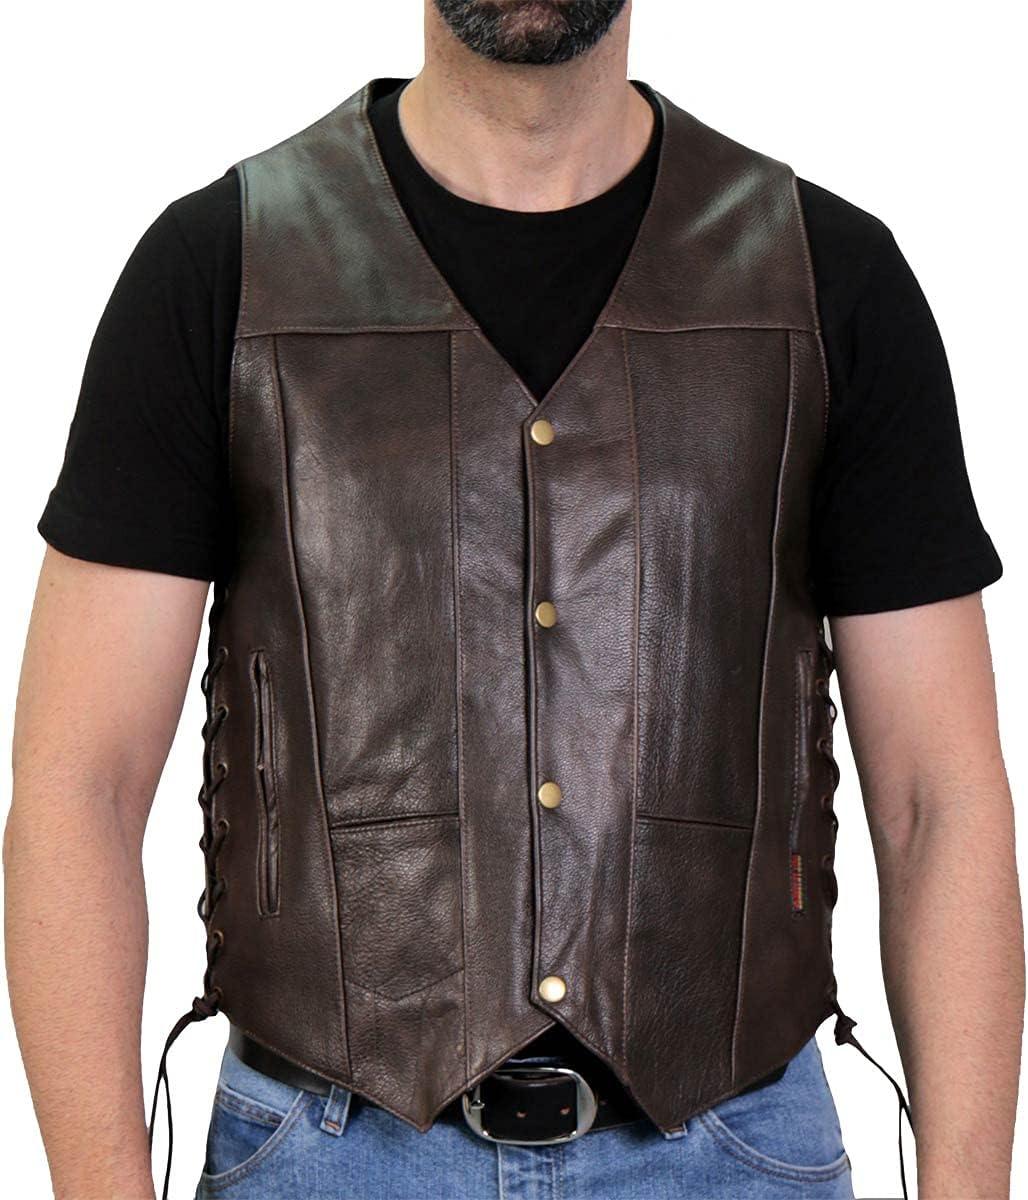 Hot Leathers VSM1040 Men's Retro Brown 'Side Lace' Club Leather Vest - 3X-Large